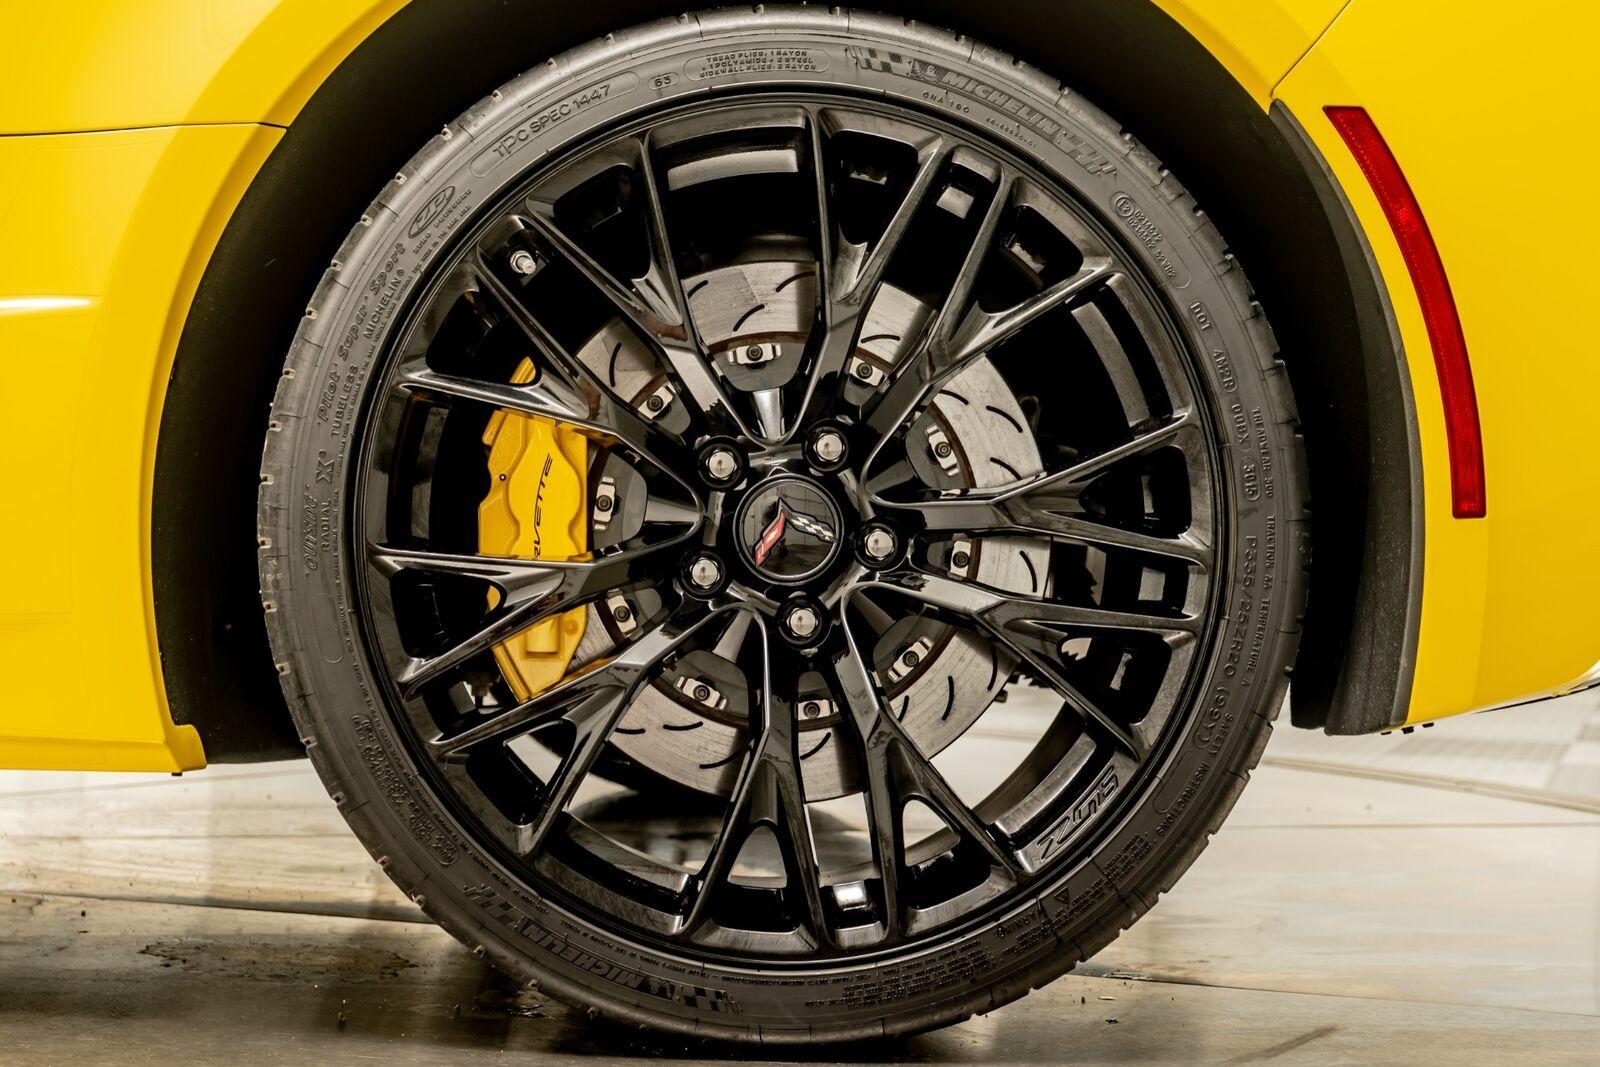 2016 Yellow Chevrolet Corvette Z06  | C7 Corvette Photo 10